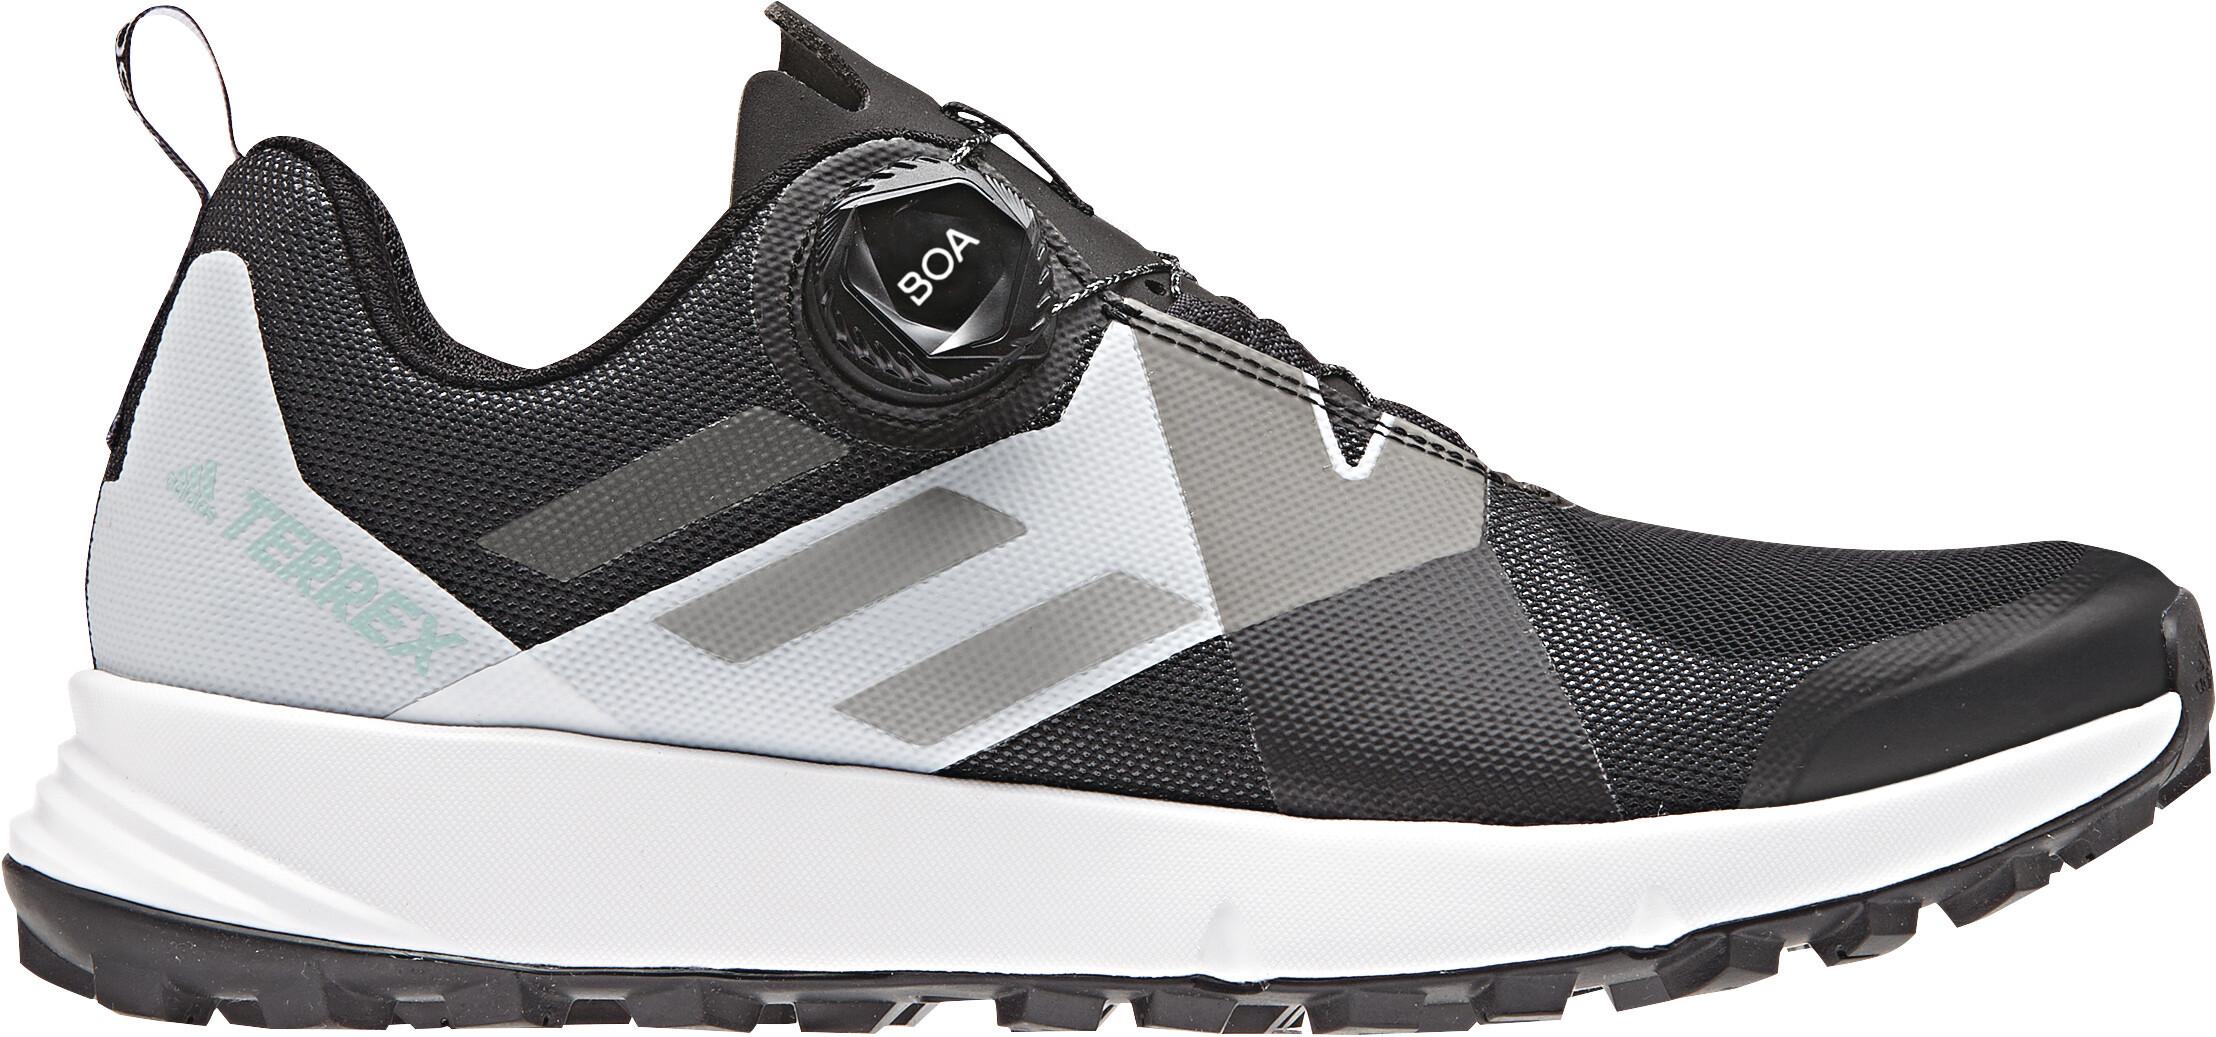 adidas TERREX Two Boa Löparskor Dam vit svart - till fenomenalt pris ... 9e94320c34cad